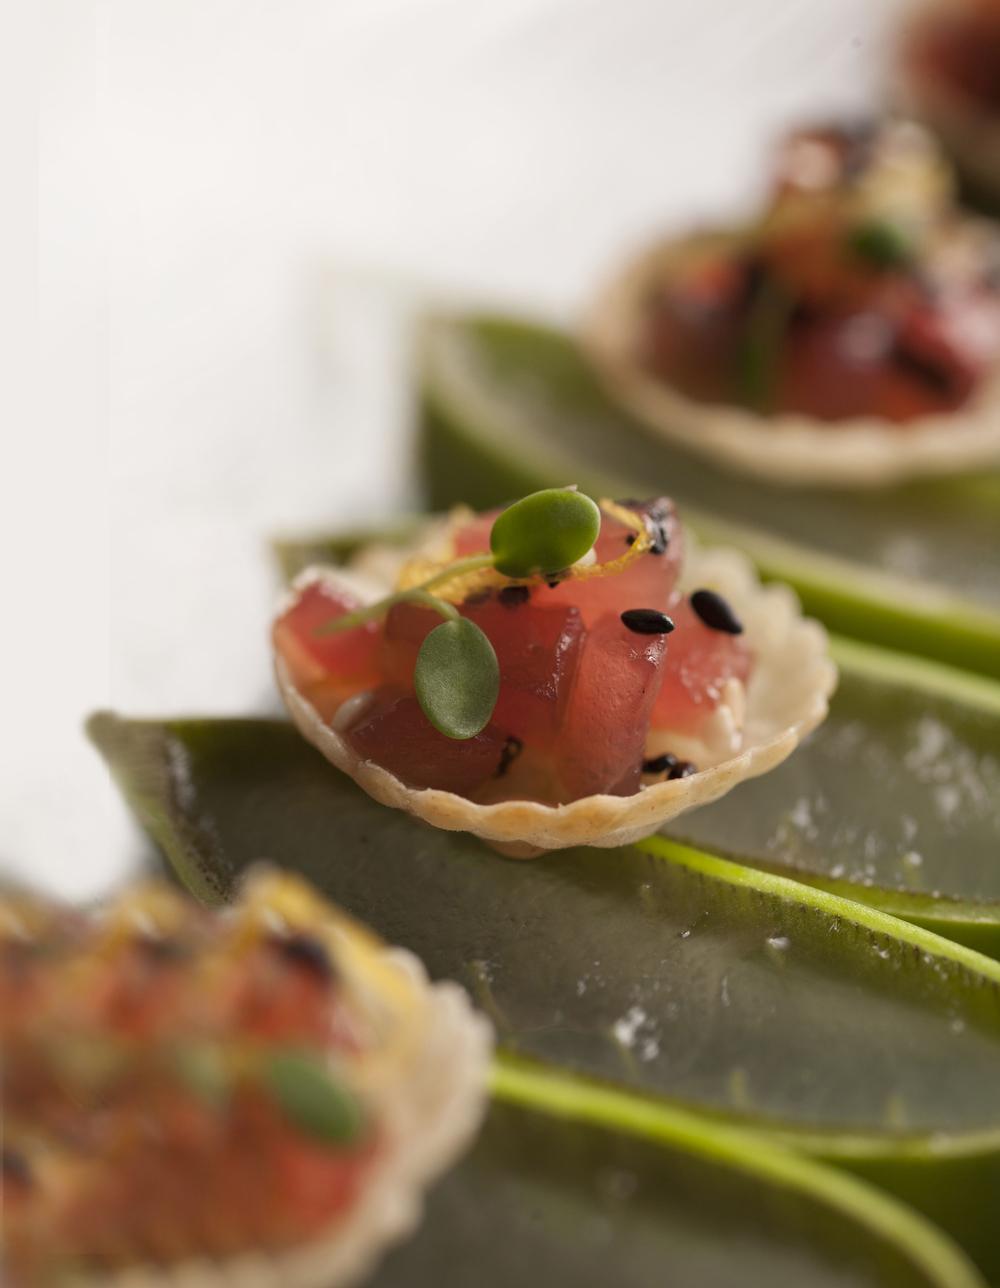 Ahi Poke Tuna, Meyer Lemon, Avocado Pearls, Wonton crisps_EDITED.jpg